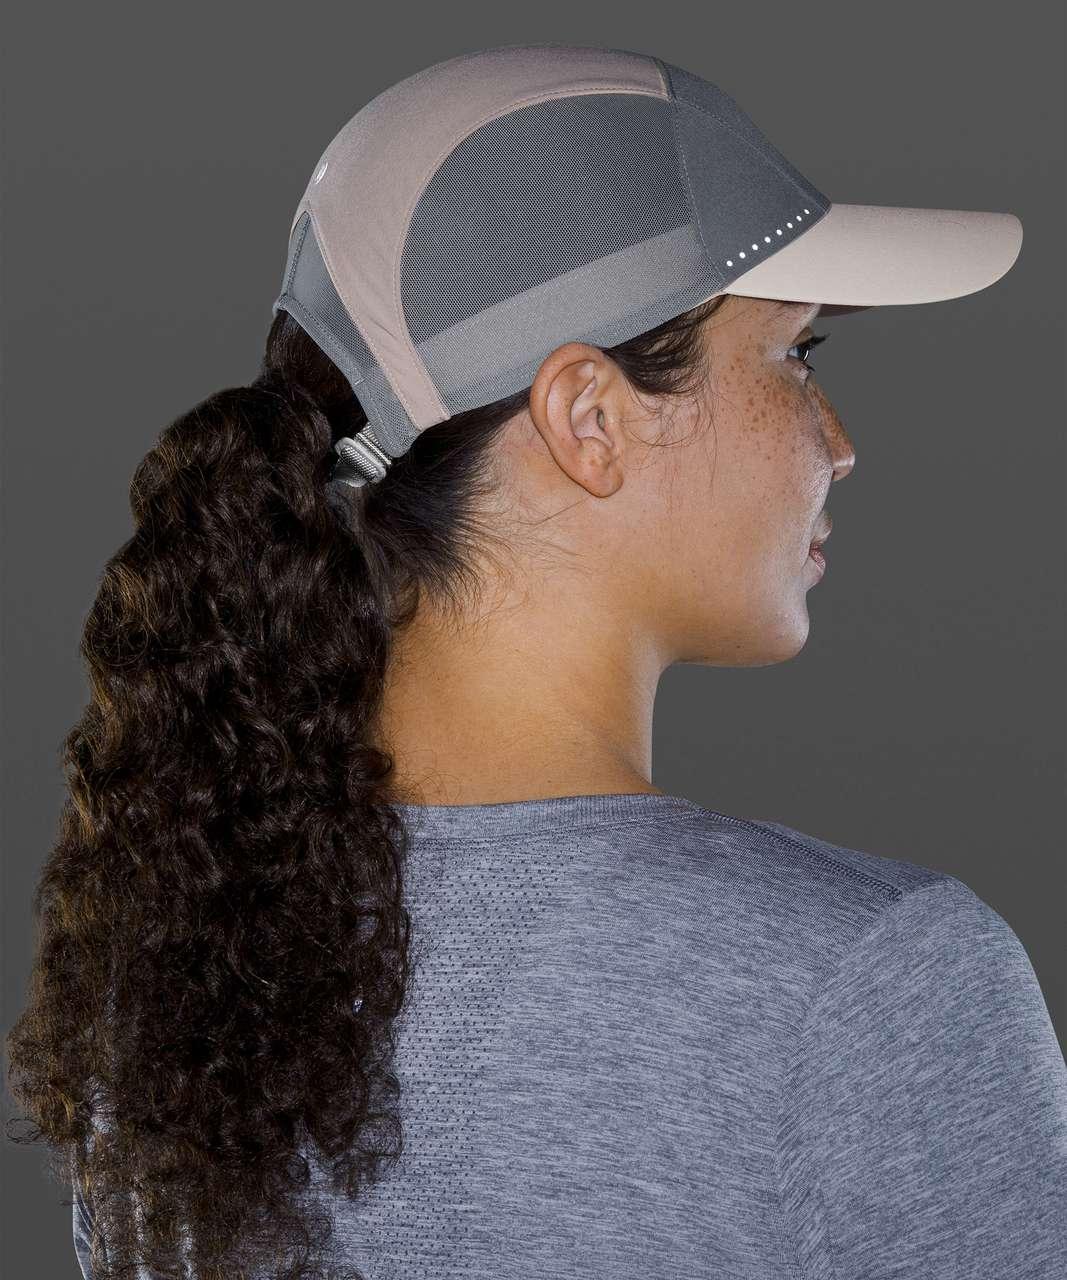 Lululemon Fast and Free Womens Run Hat Elite - Cafe Au Lait / Rhino Grey / White Opal